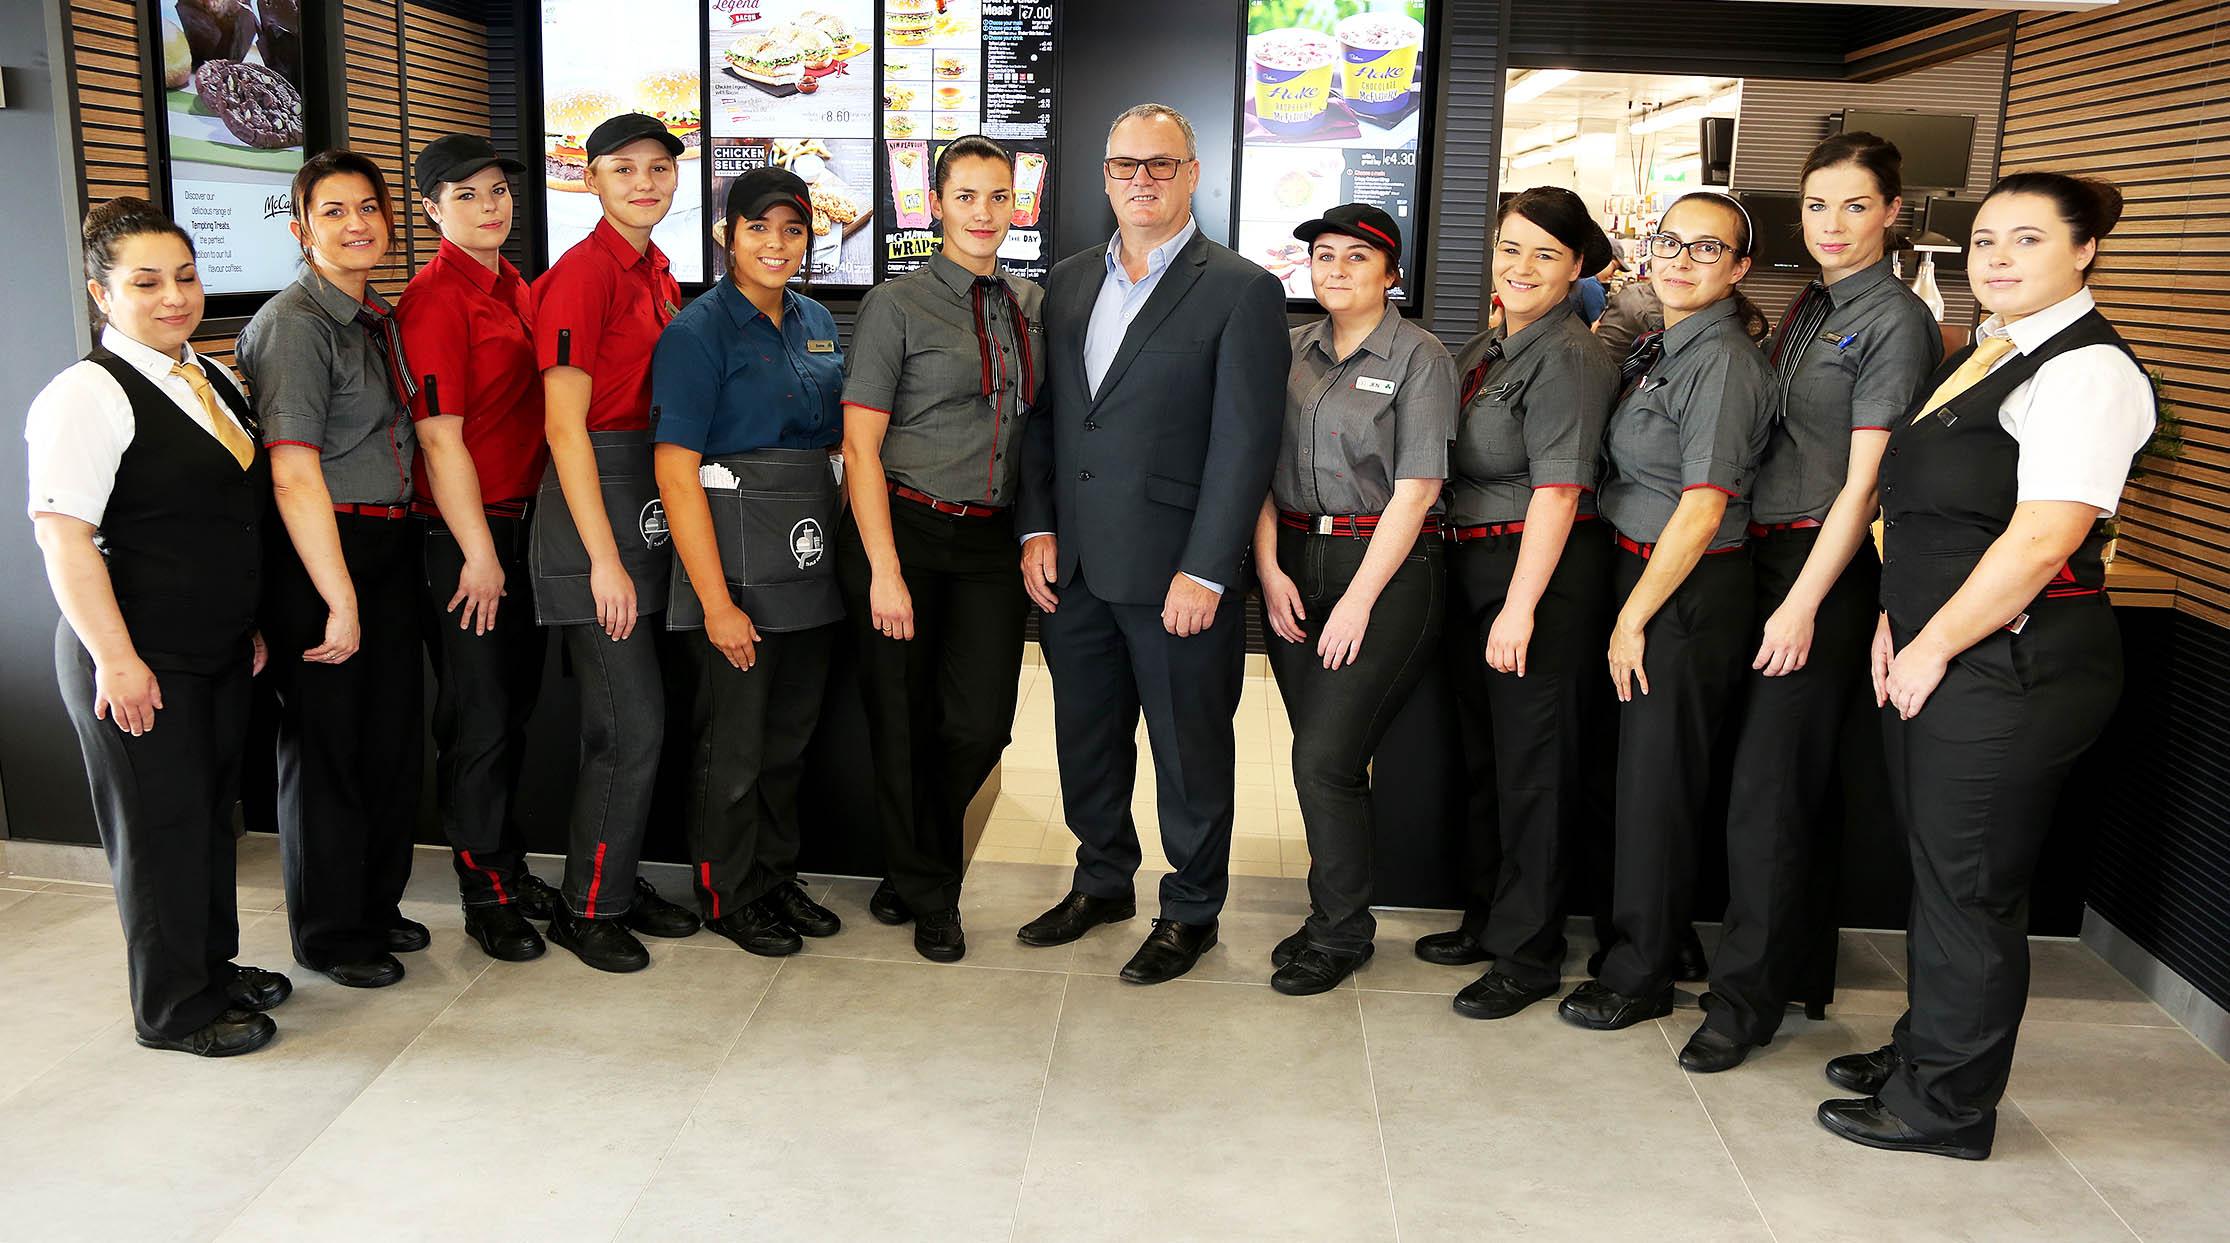 Manager catalog mcdonalds uniform What is